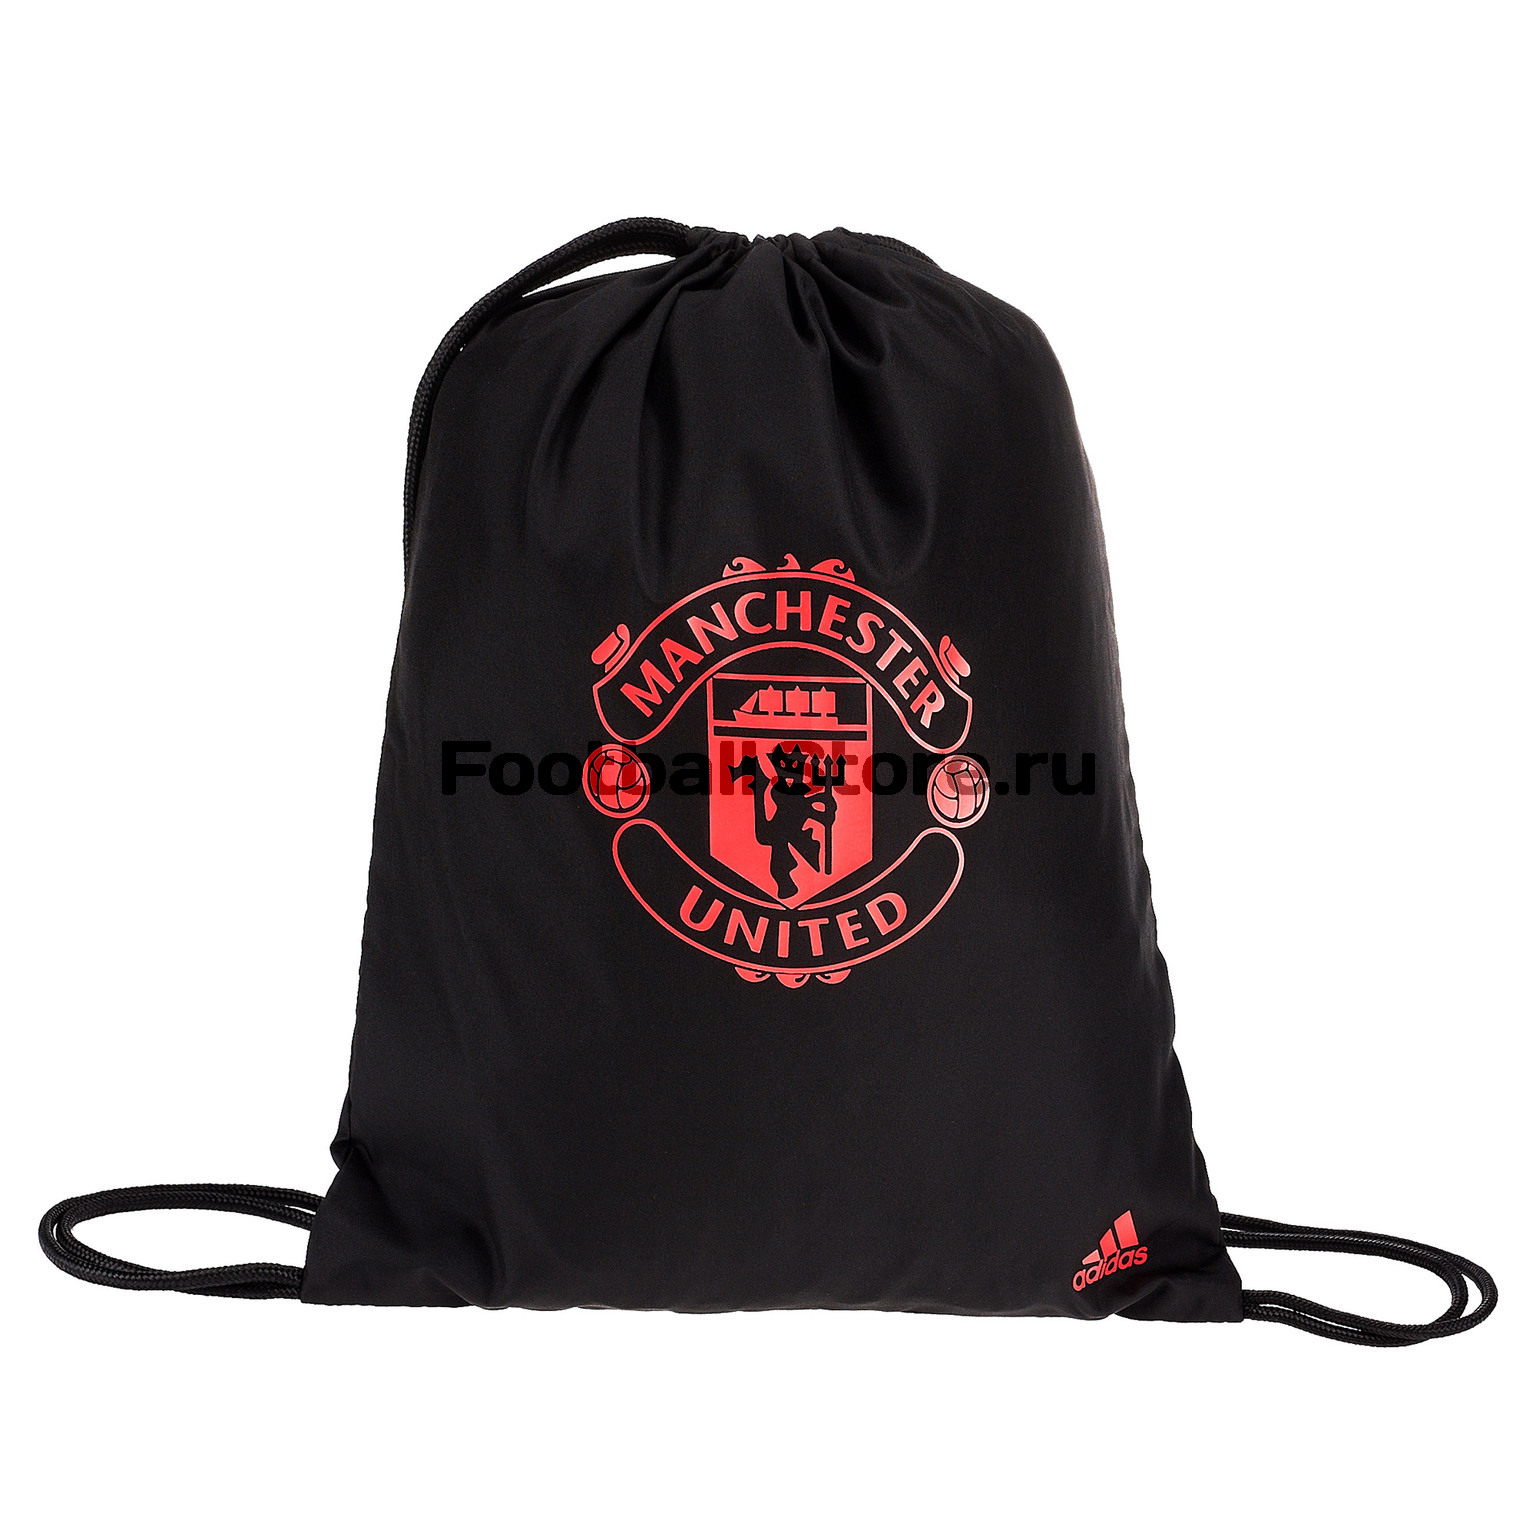 Сумка для обуви Adidas Manchester United 2018/19 рюкзак adidas manchester united cy5581